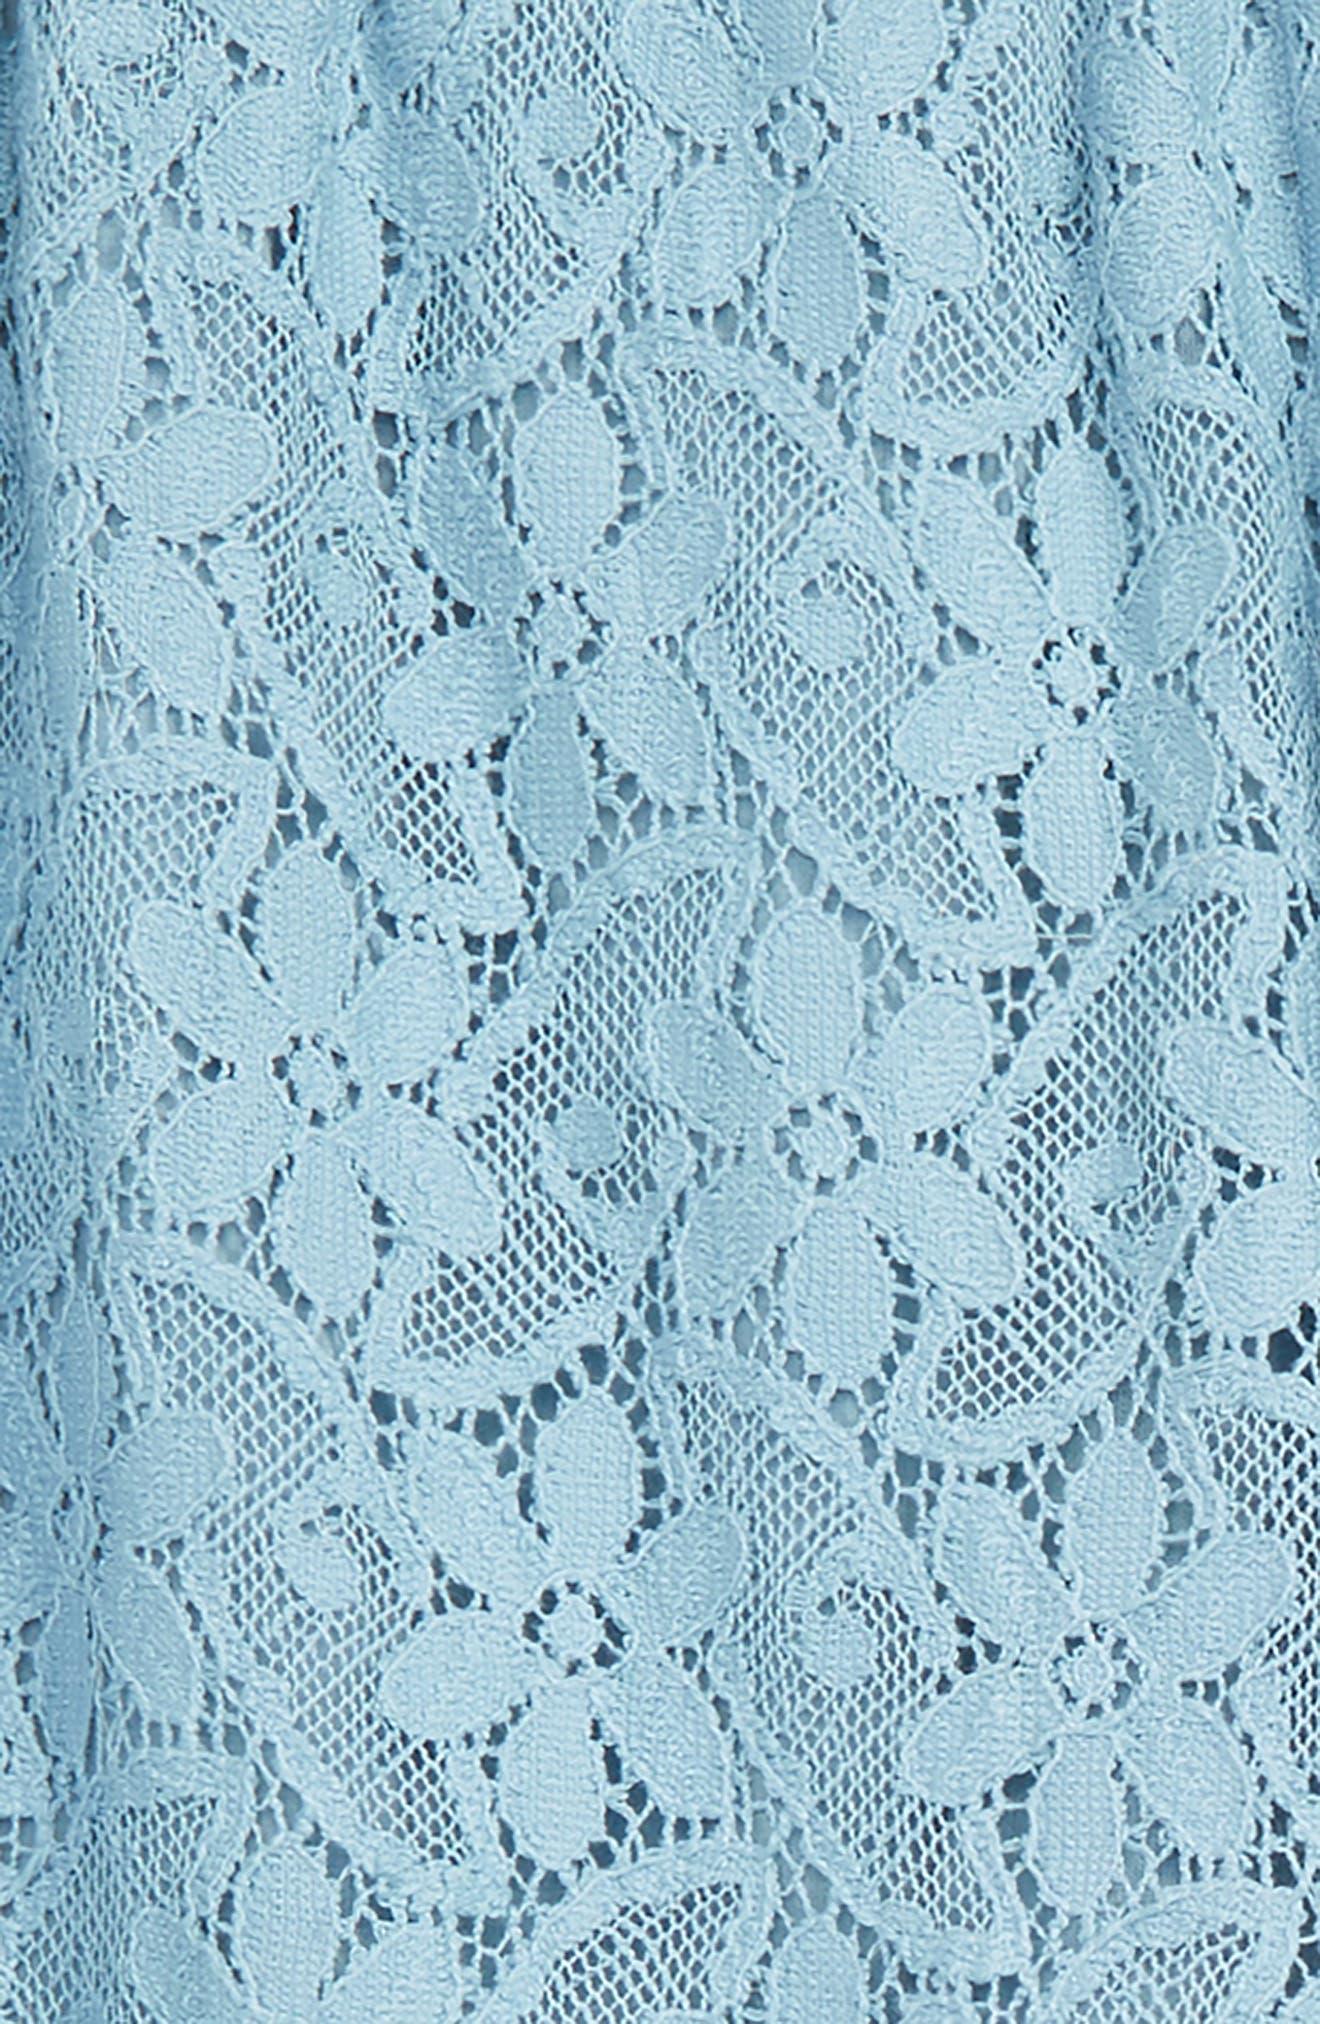 GUCCI,                             Lace Jogger Pants,                             Alternate thumbnail 2, color,                             SEA CLEAR BLUE